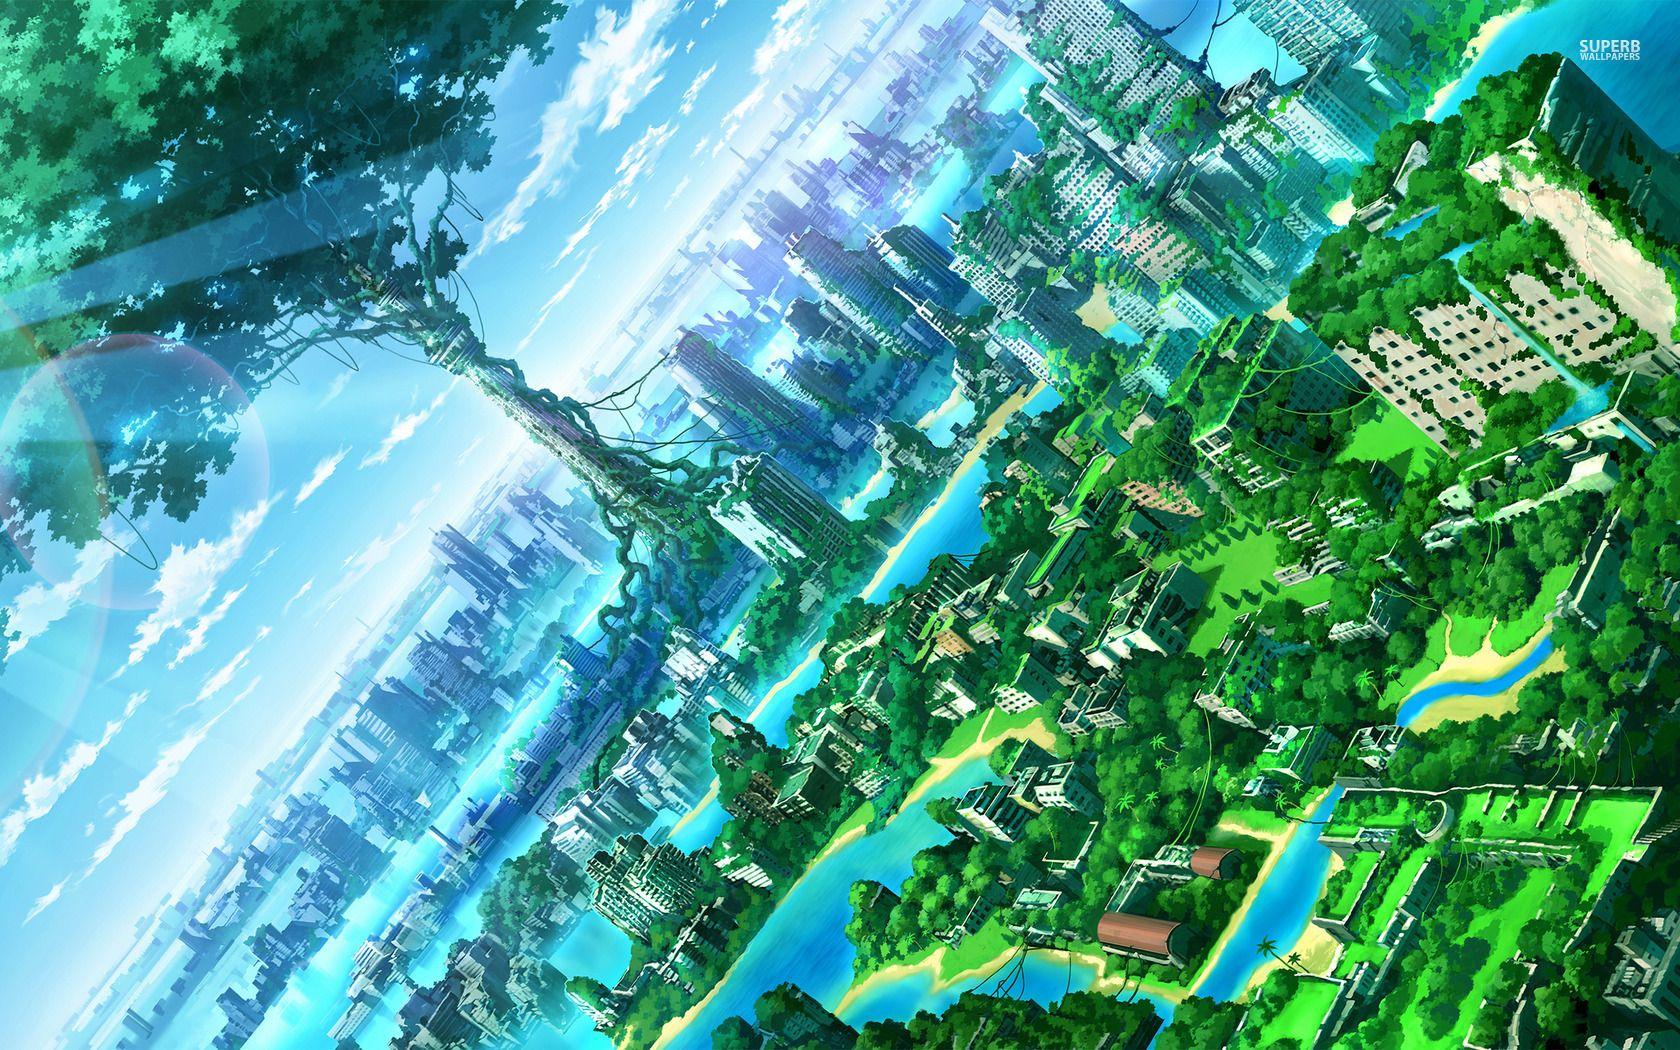 Green City Wallpaper Anime Backgrounds Wallpapers Anime Scenery Wallpaper Anime Wallpaper